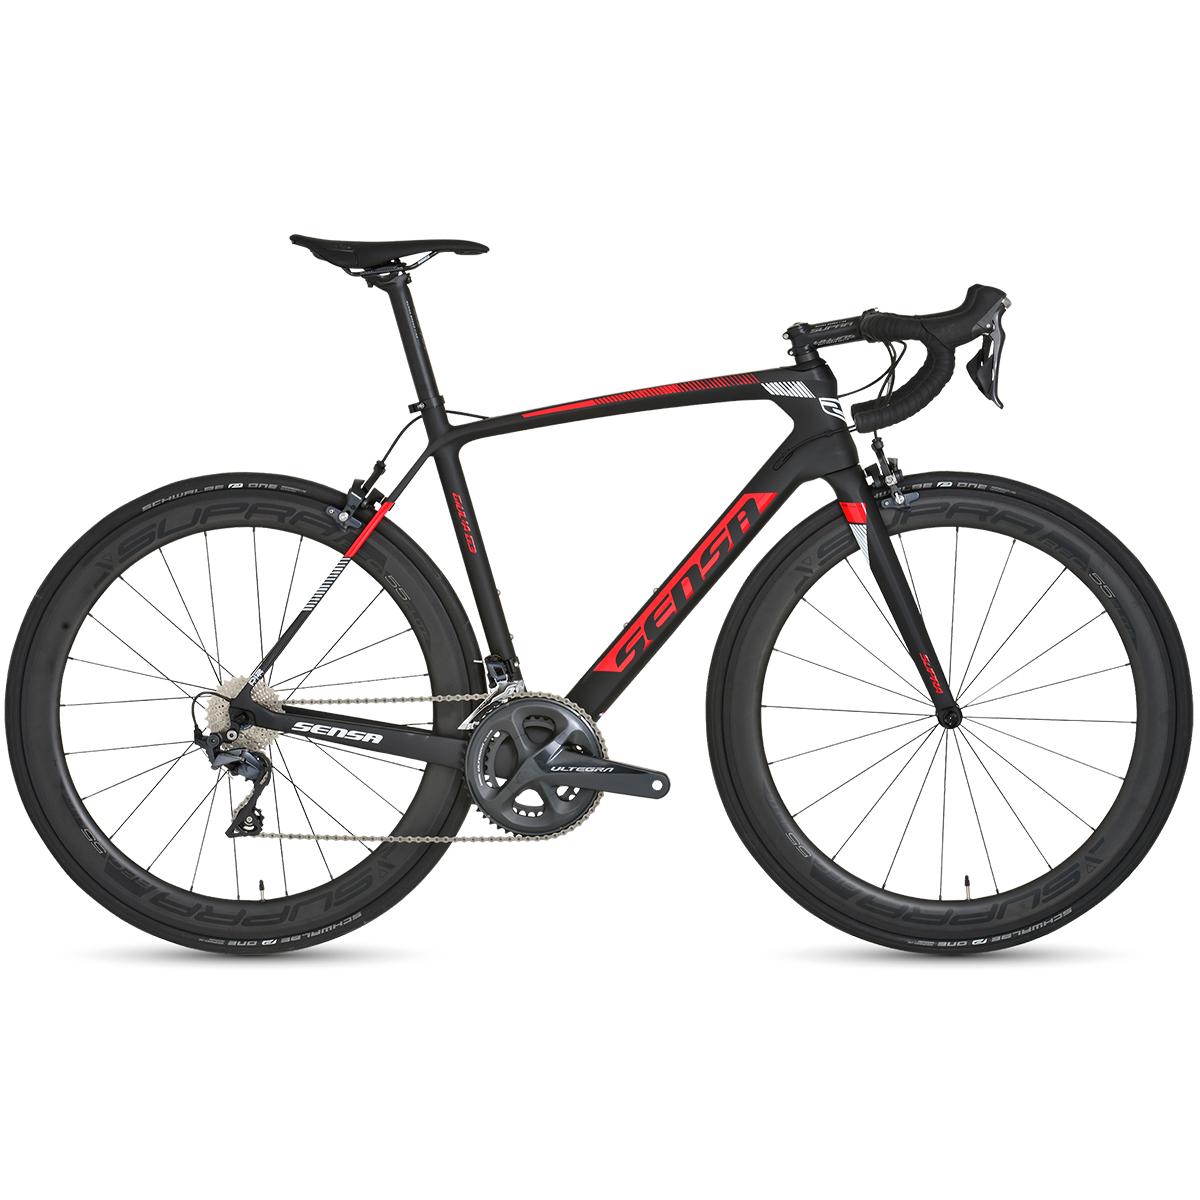 Sensa Giulia G3 Ultegra Road Bike - 2019